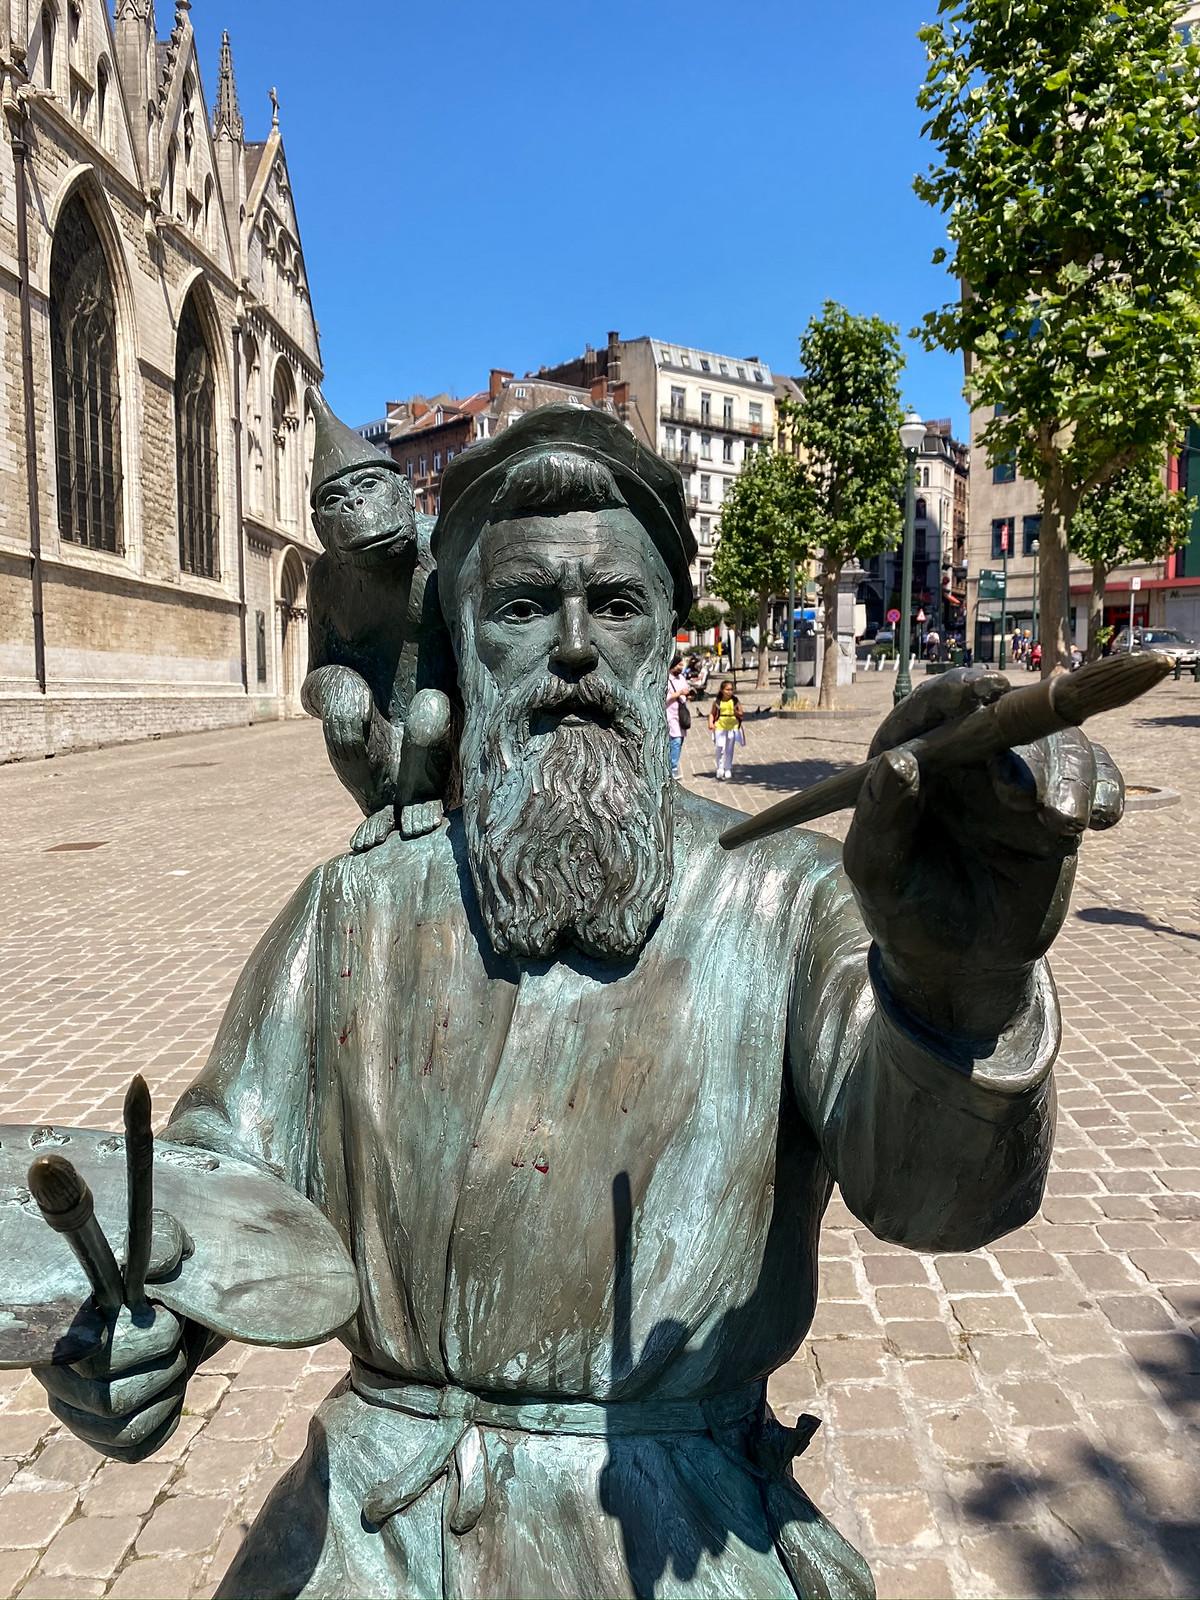 The statue of Pieter Bruegel in Brussels